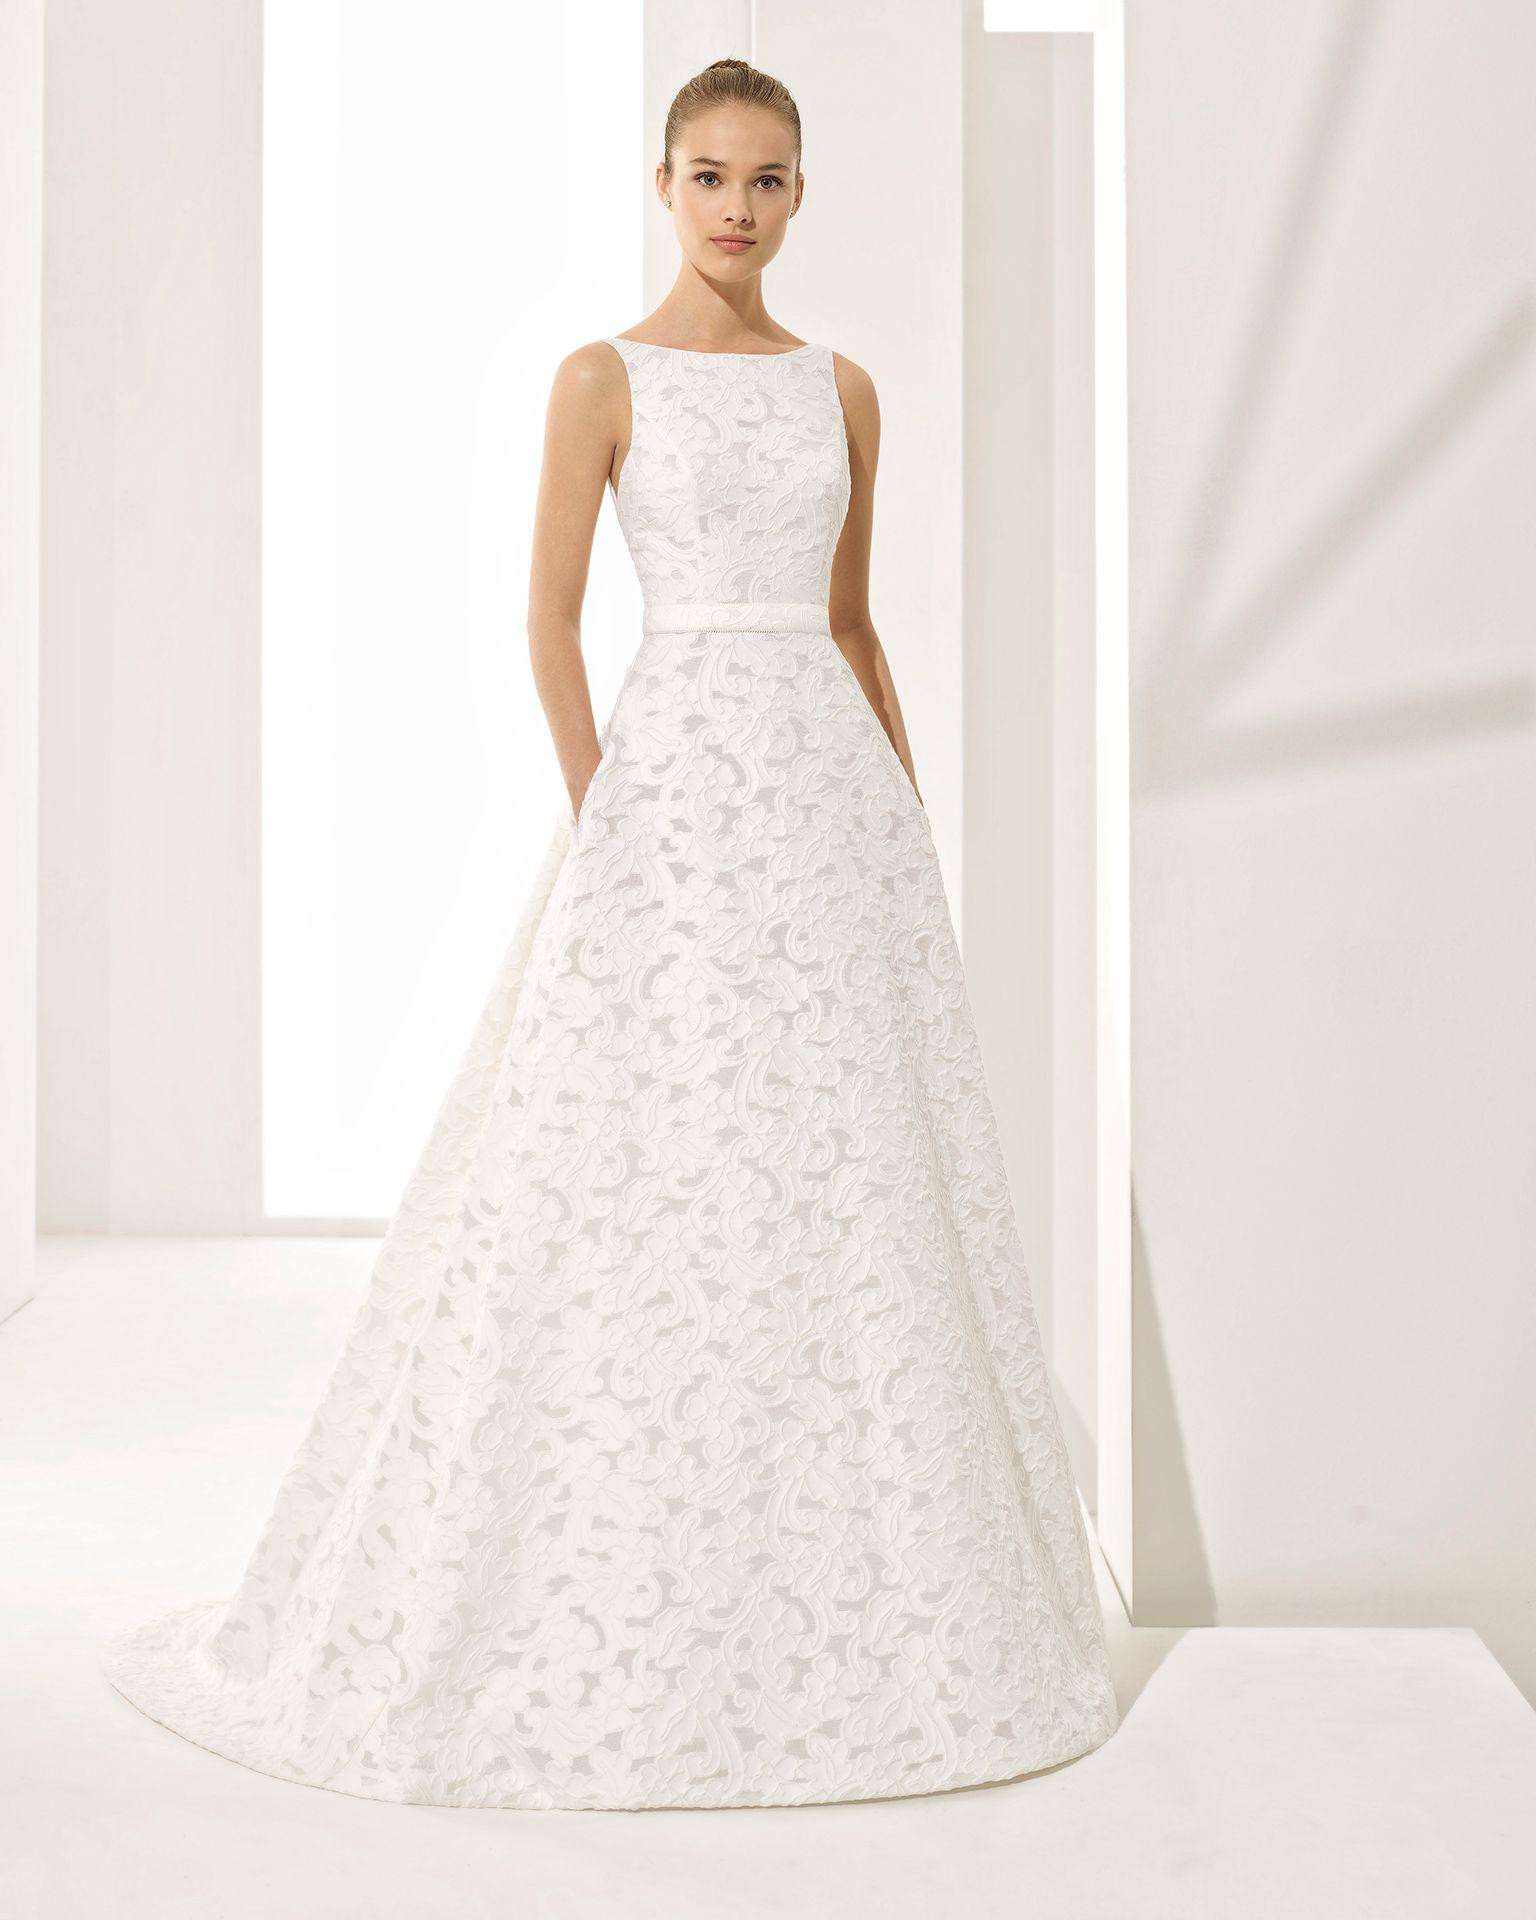 PARALEL - Hochzeit 2018. Kollektion Rosa Clará Couture | Pinterest ...